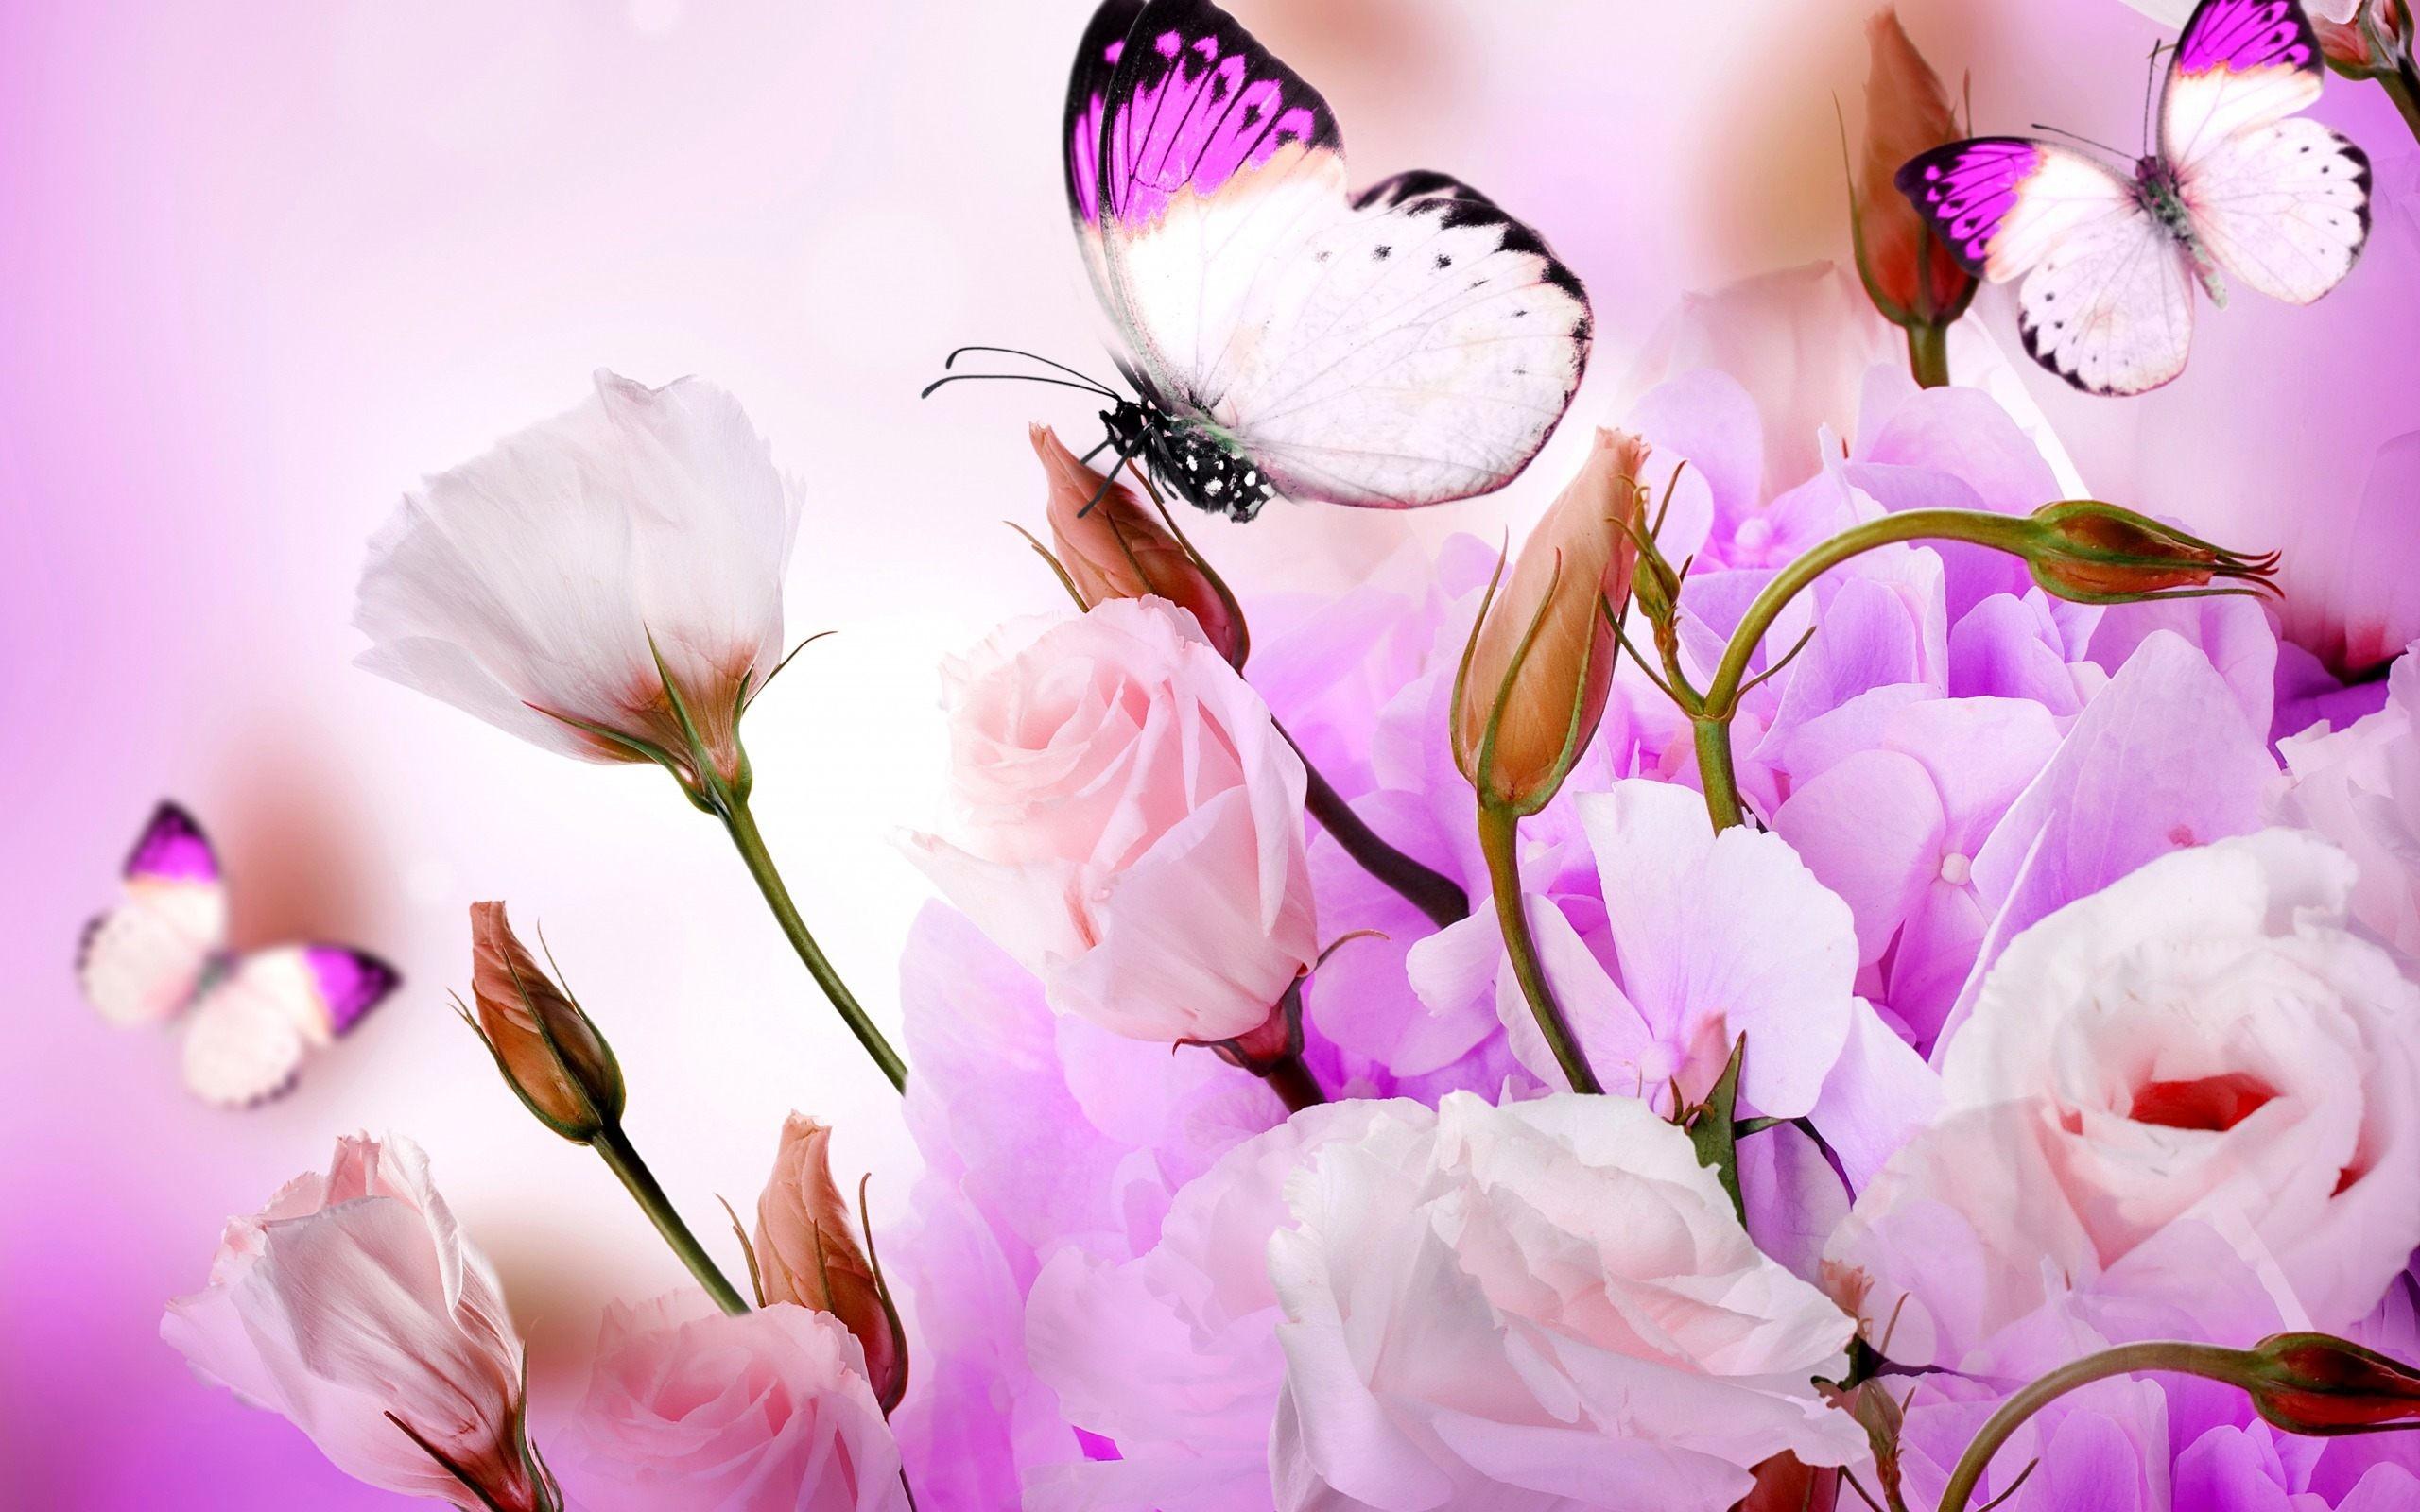 0 Flower Butterfly Wallpaper Pixels Talk Flower With Butterfly Wallpaper HD  Download High Quality